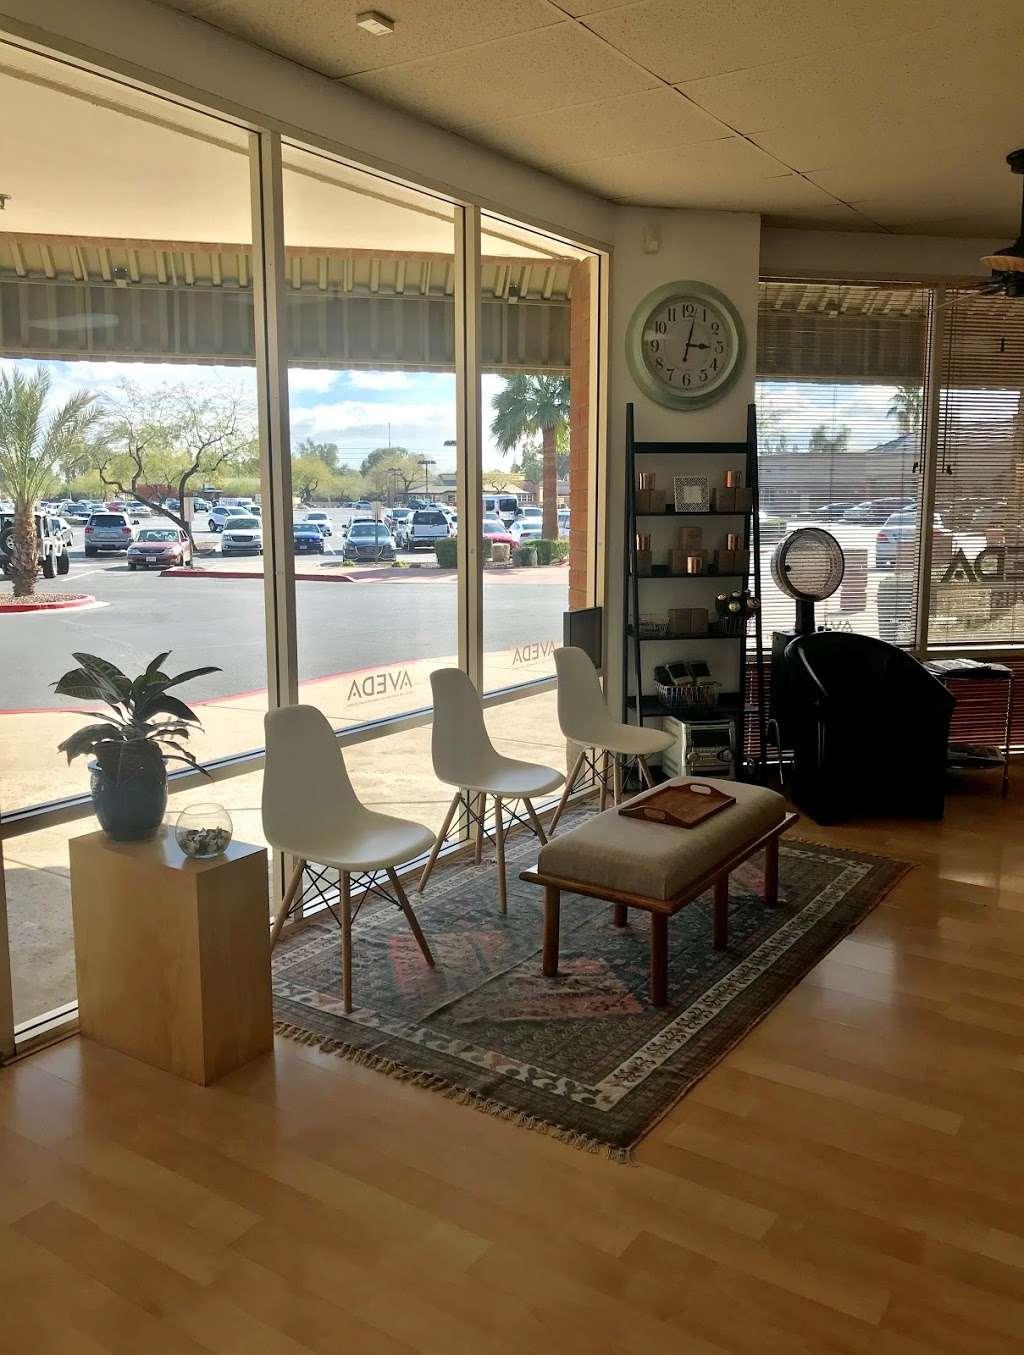 Waters + Co Salon - hair care  | Photo 4 of 10 | Address: 8664 E Shea Blvd Ste 158, Scottsdale, AZ 85260, USA | Phone: (480) 970-1711